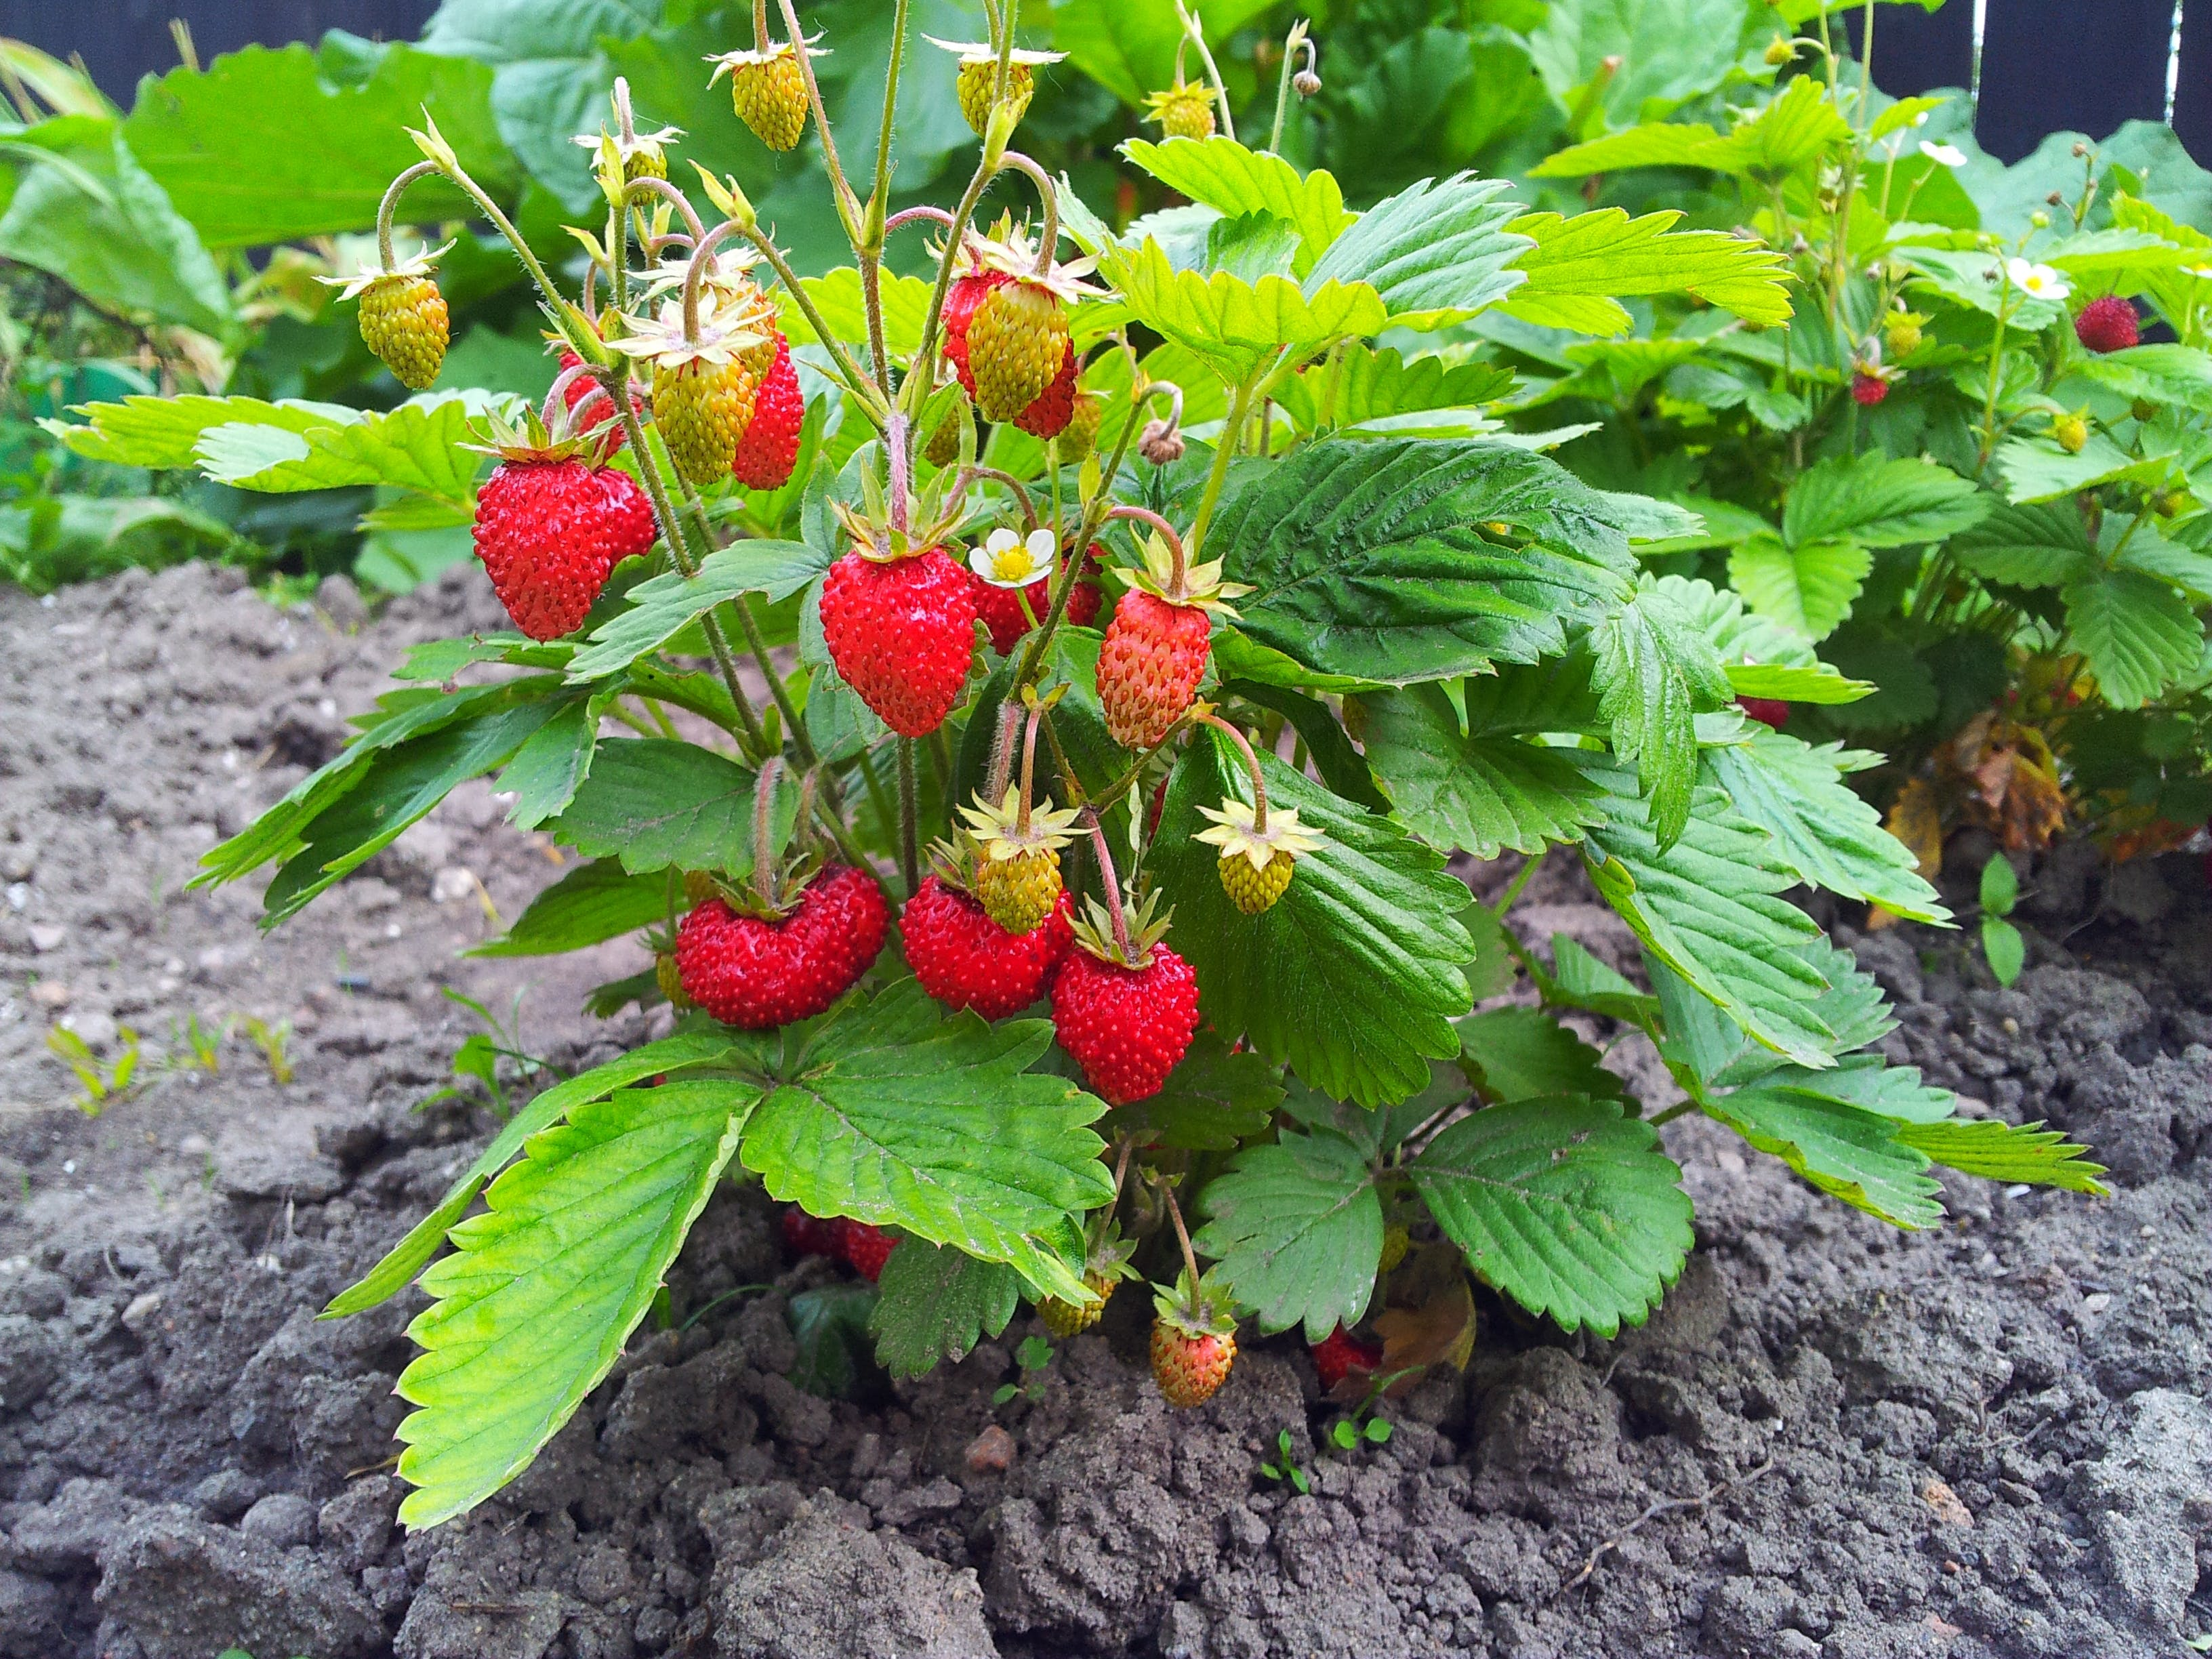 Bor Jordbær